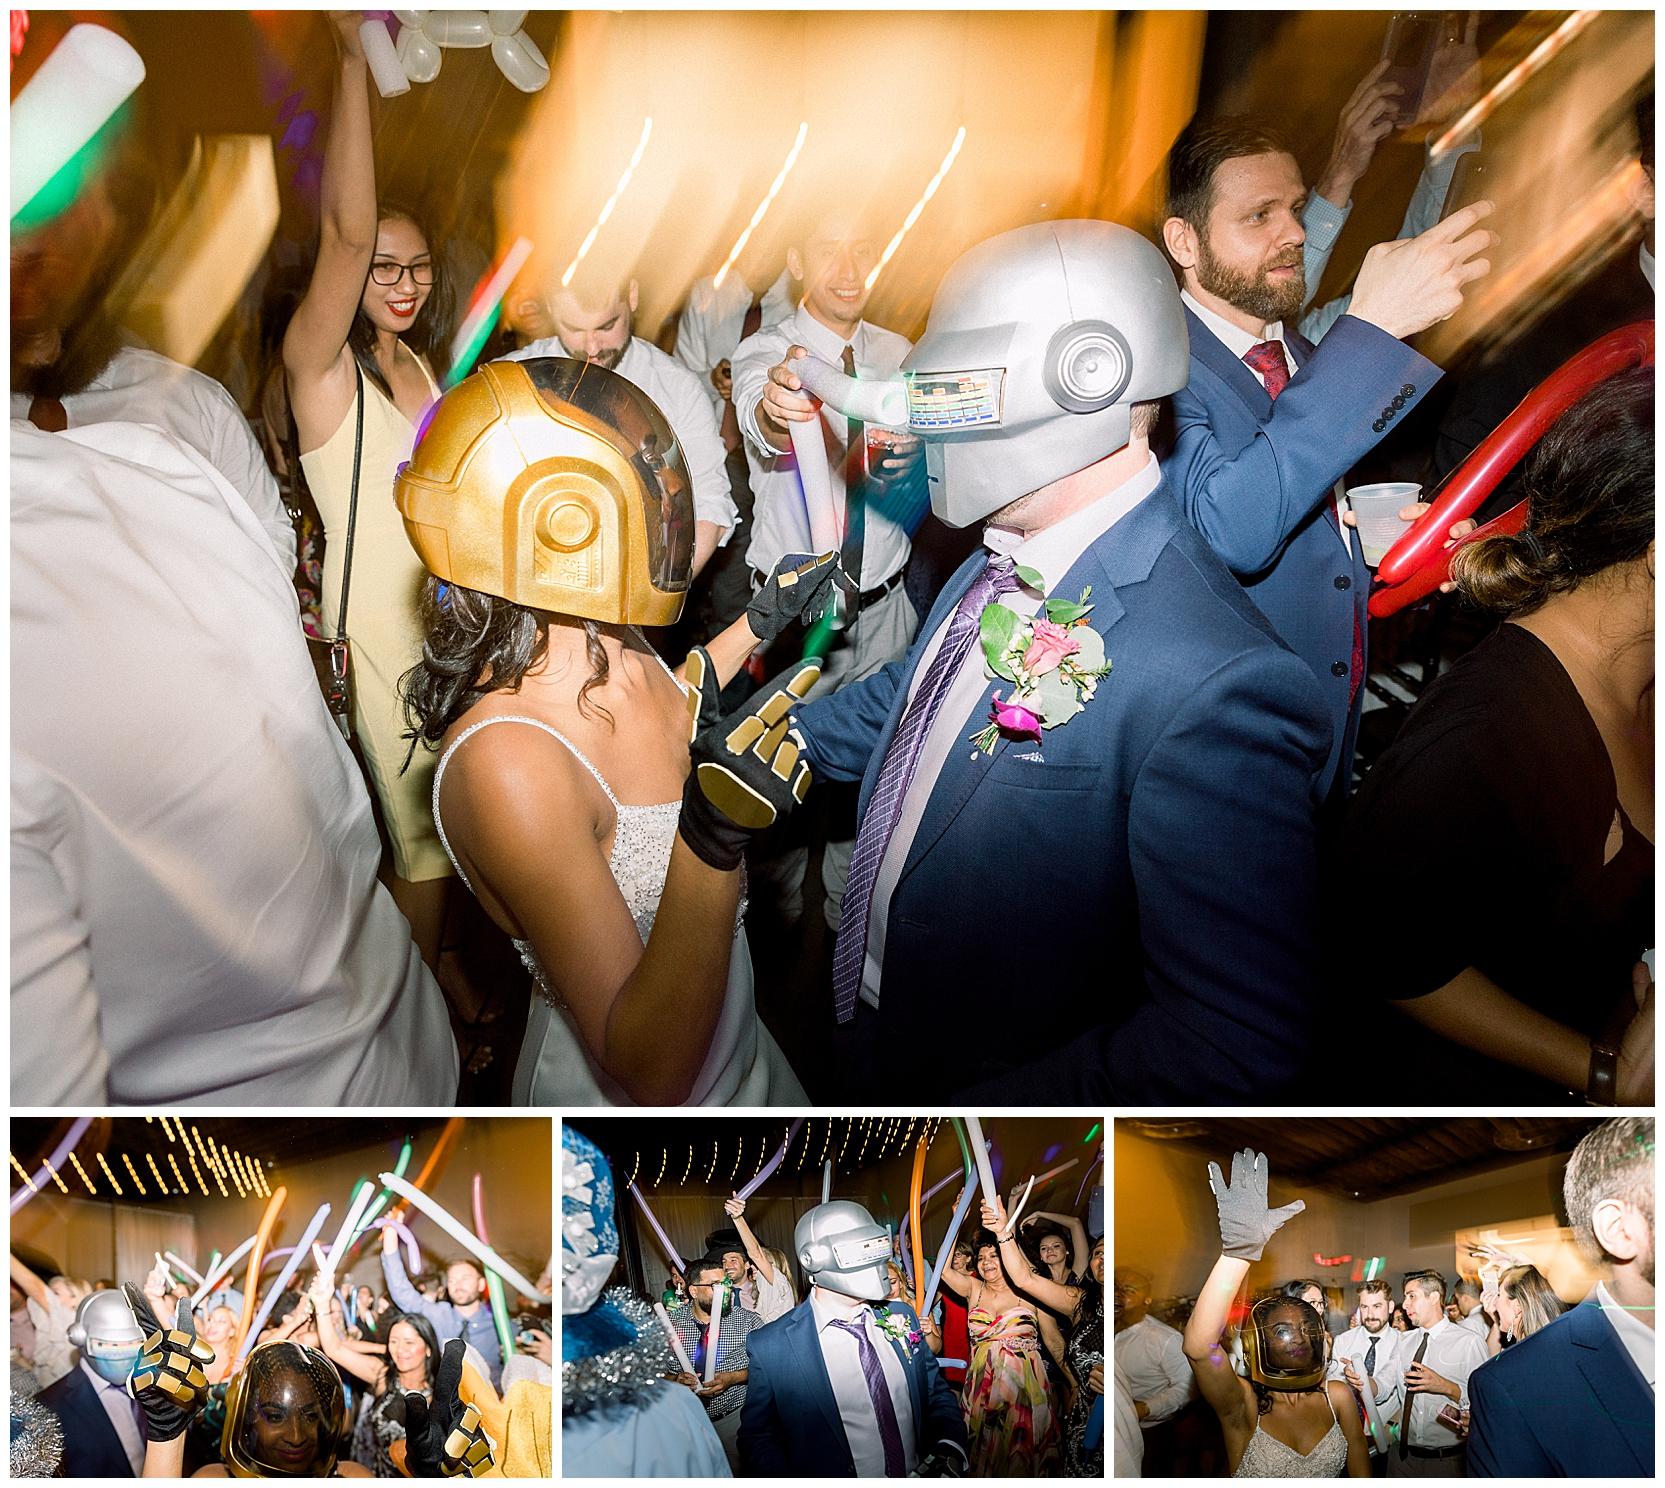 jessicafredericks_lakeland_tampa_wedding_purple_crazy hour_0091.jpg